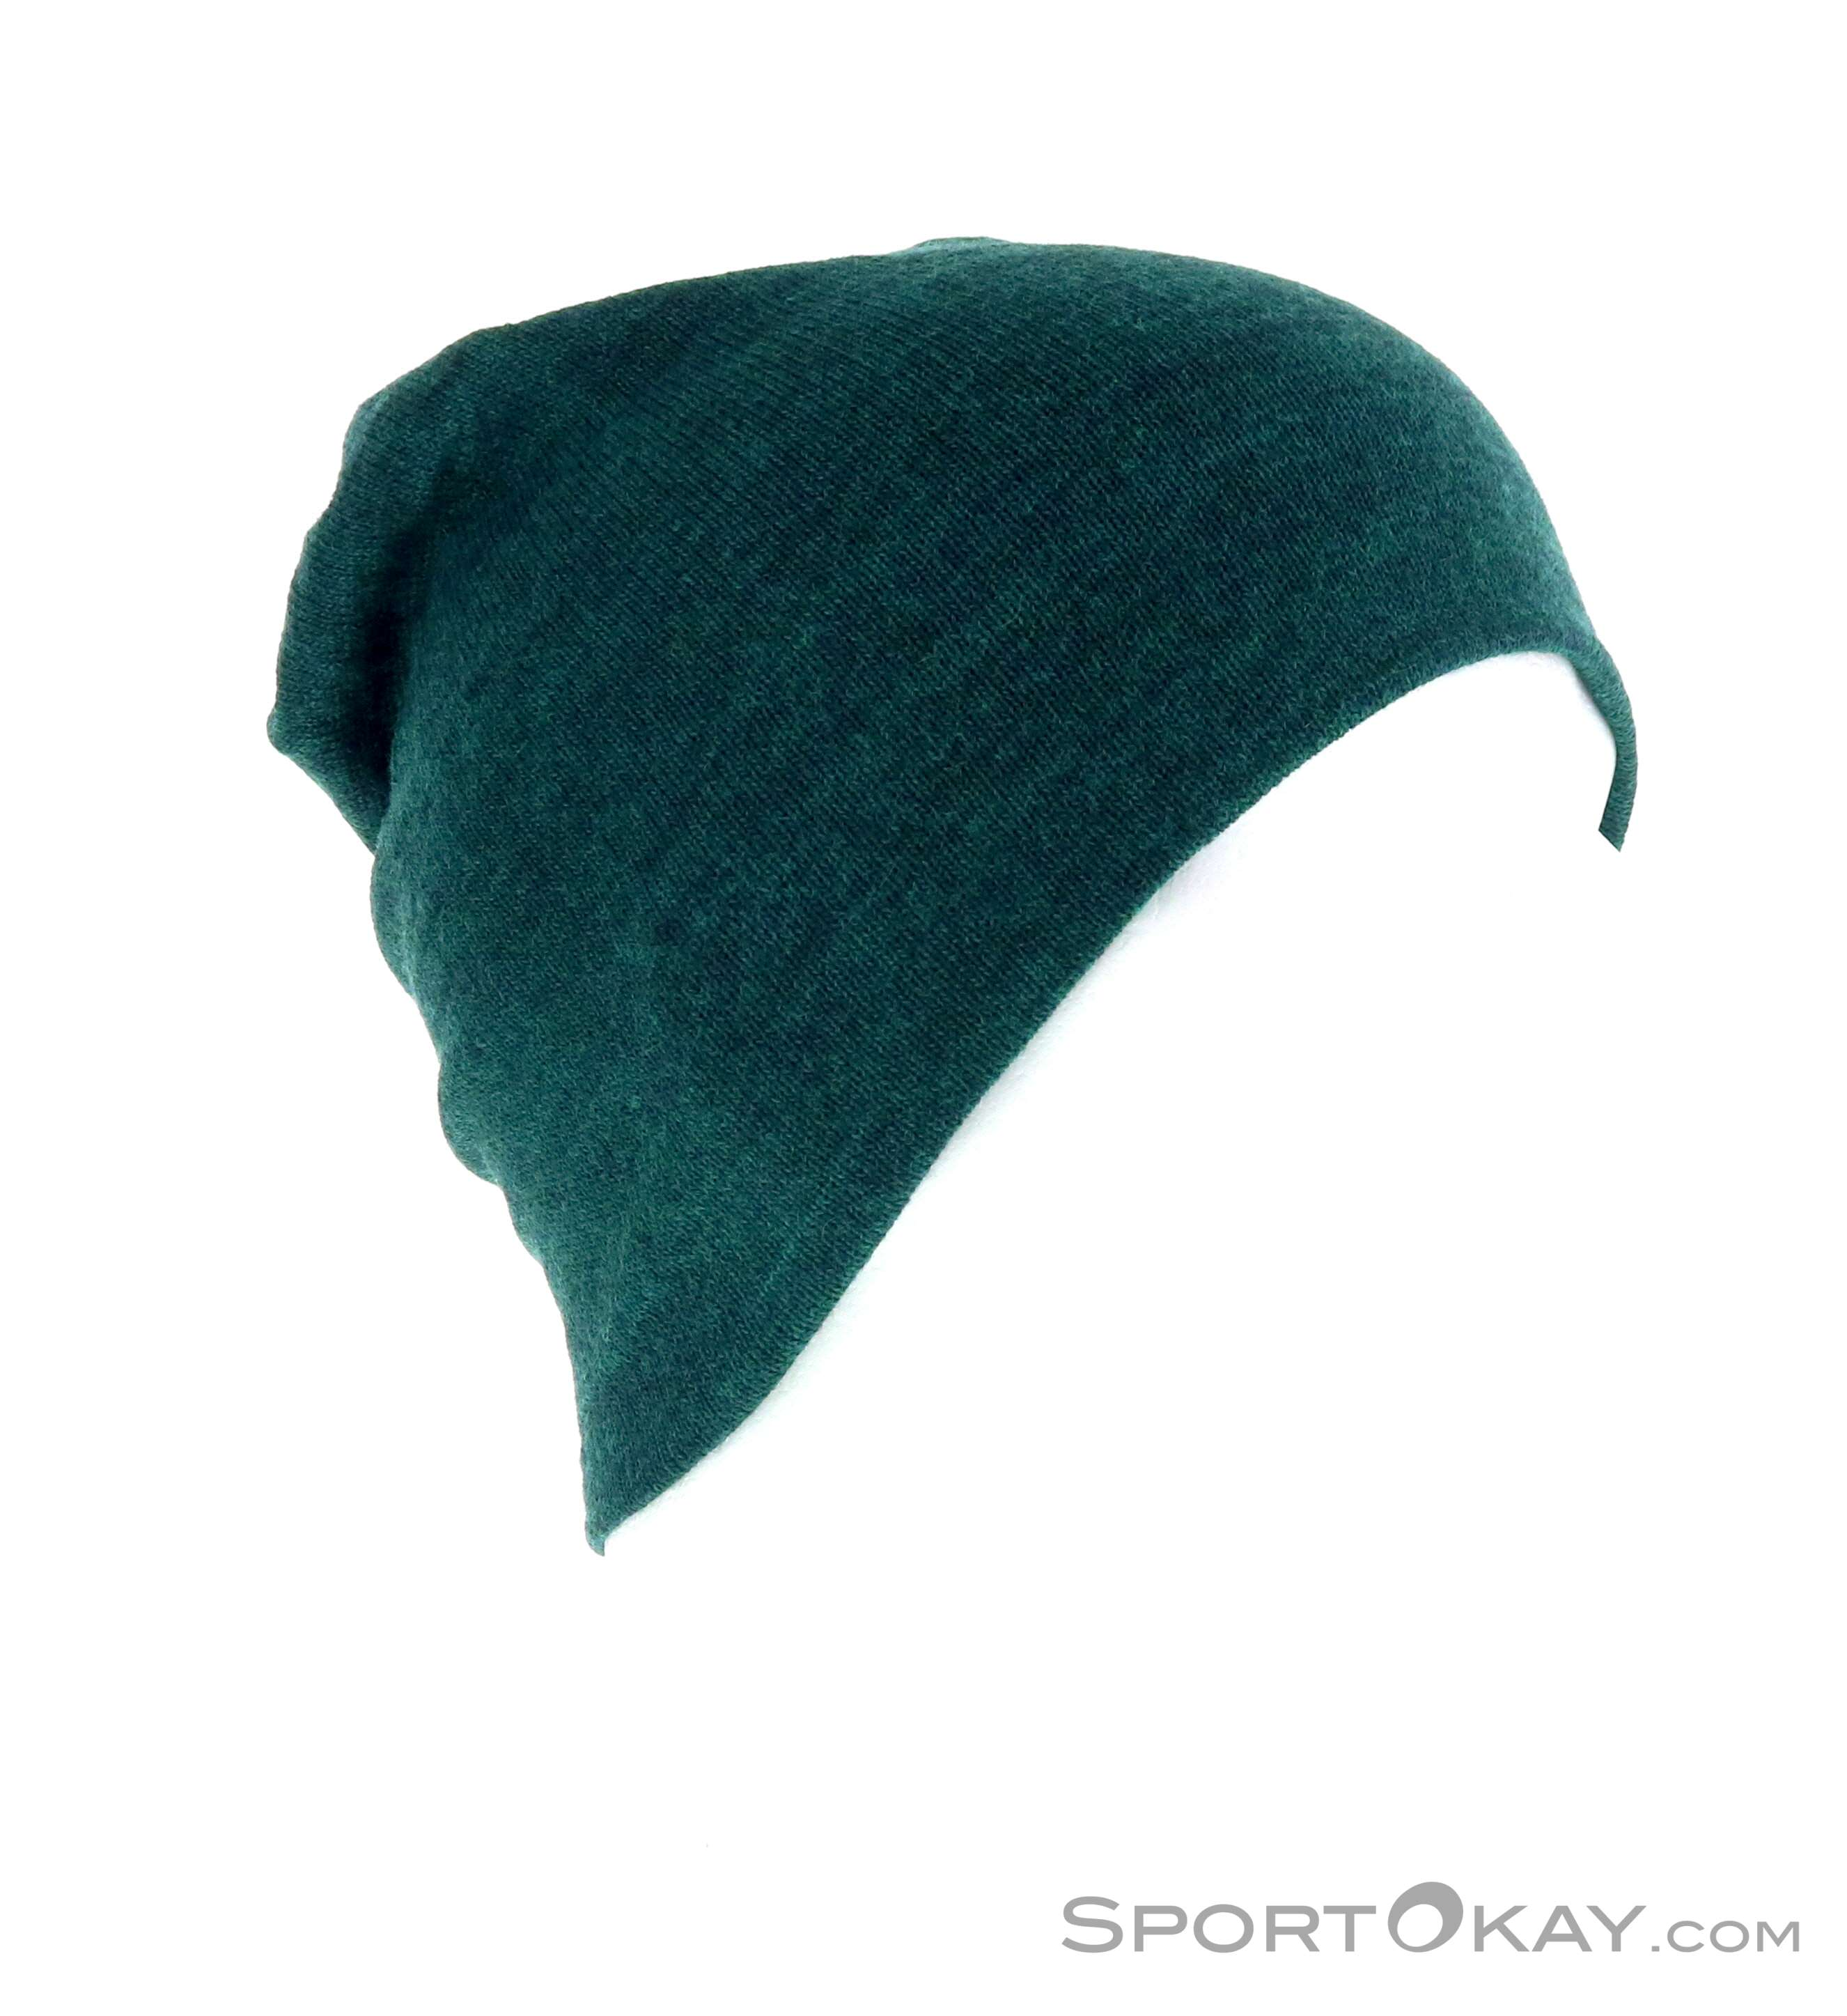 40b36515b1e0eb Chillaz Relaxed Beanie Cap - Caps   Headbands - Outdoor Clothing ...